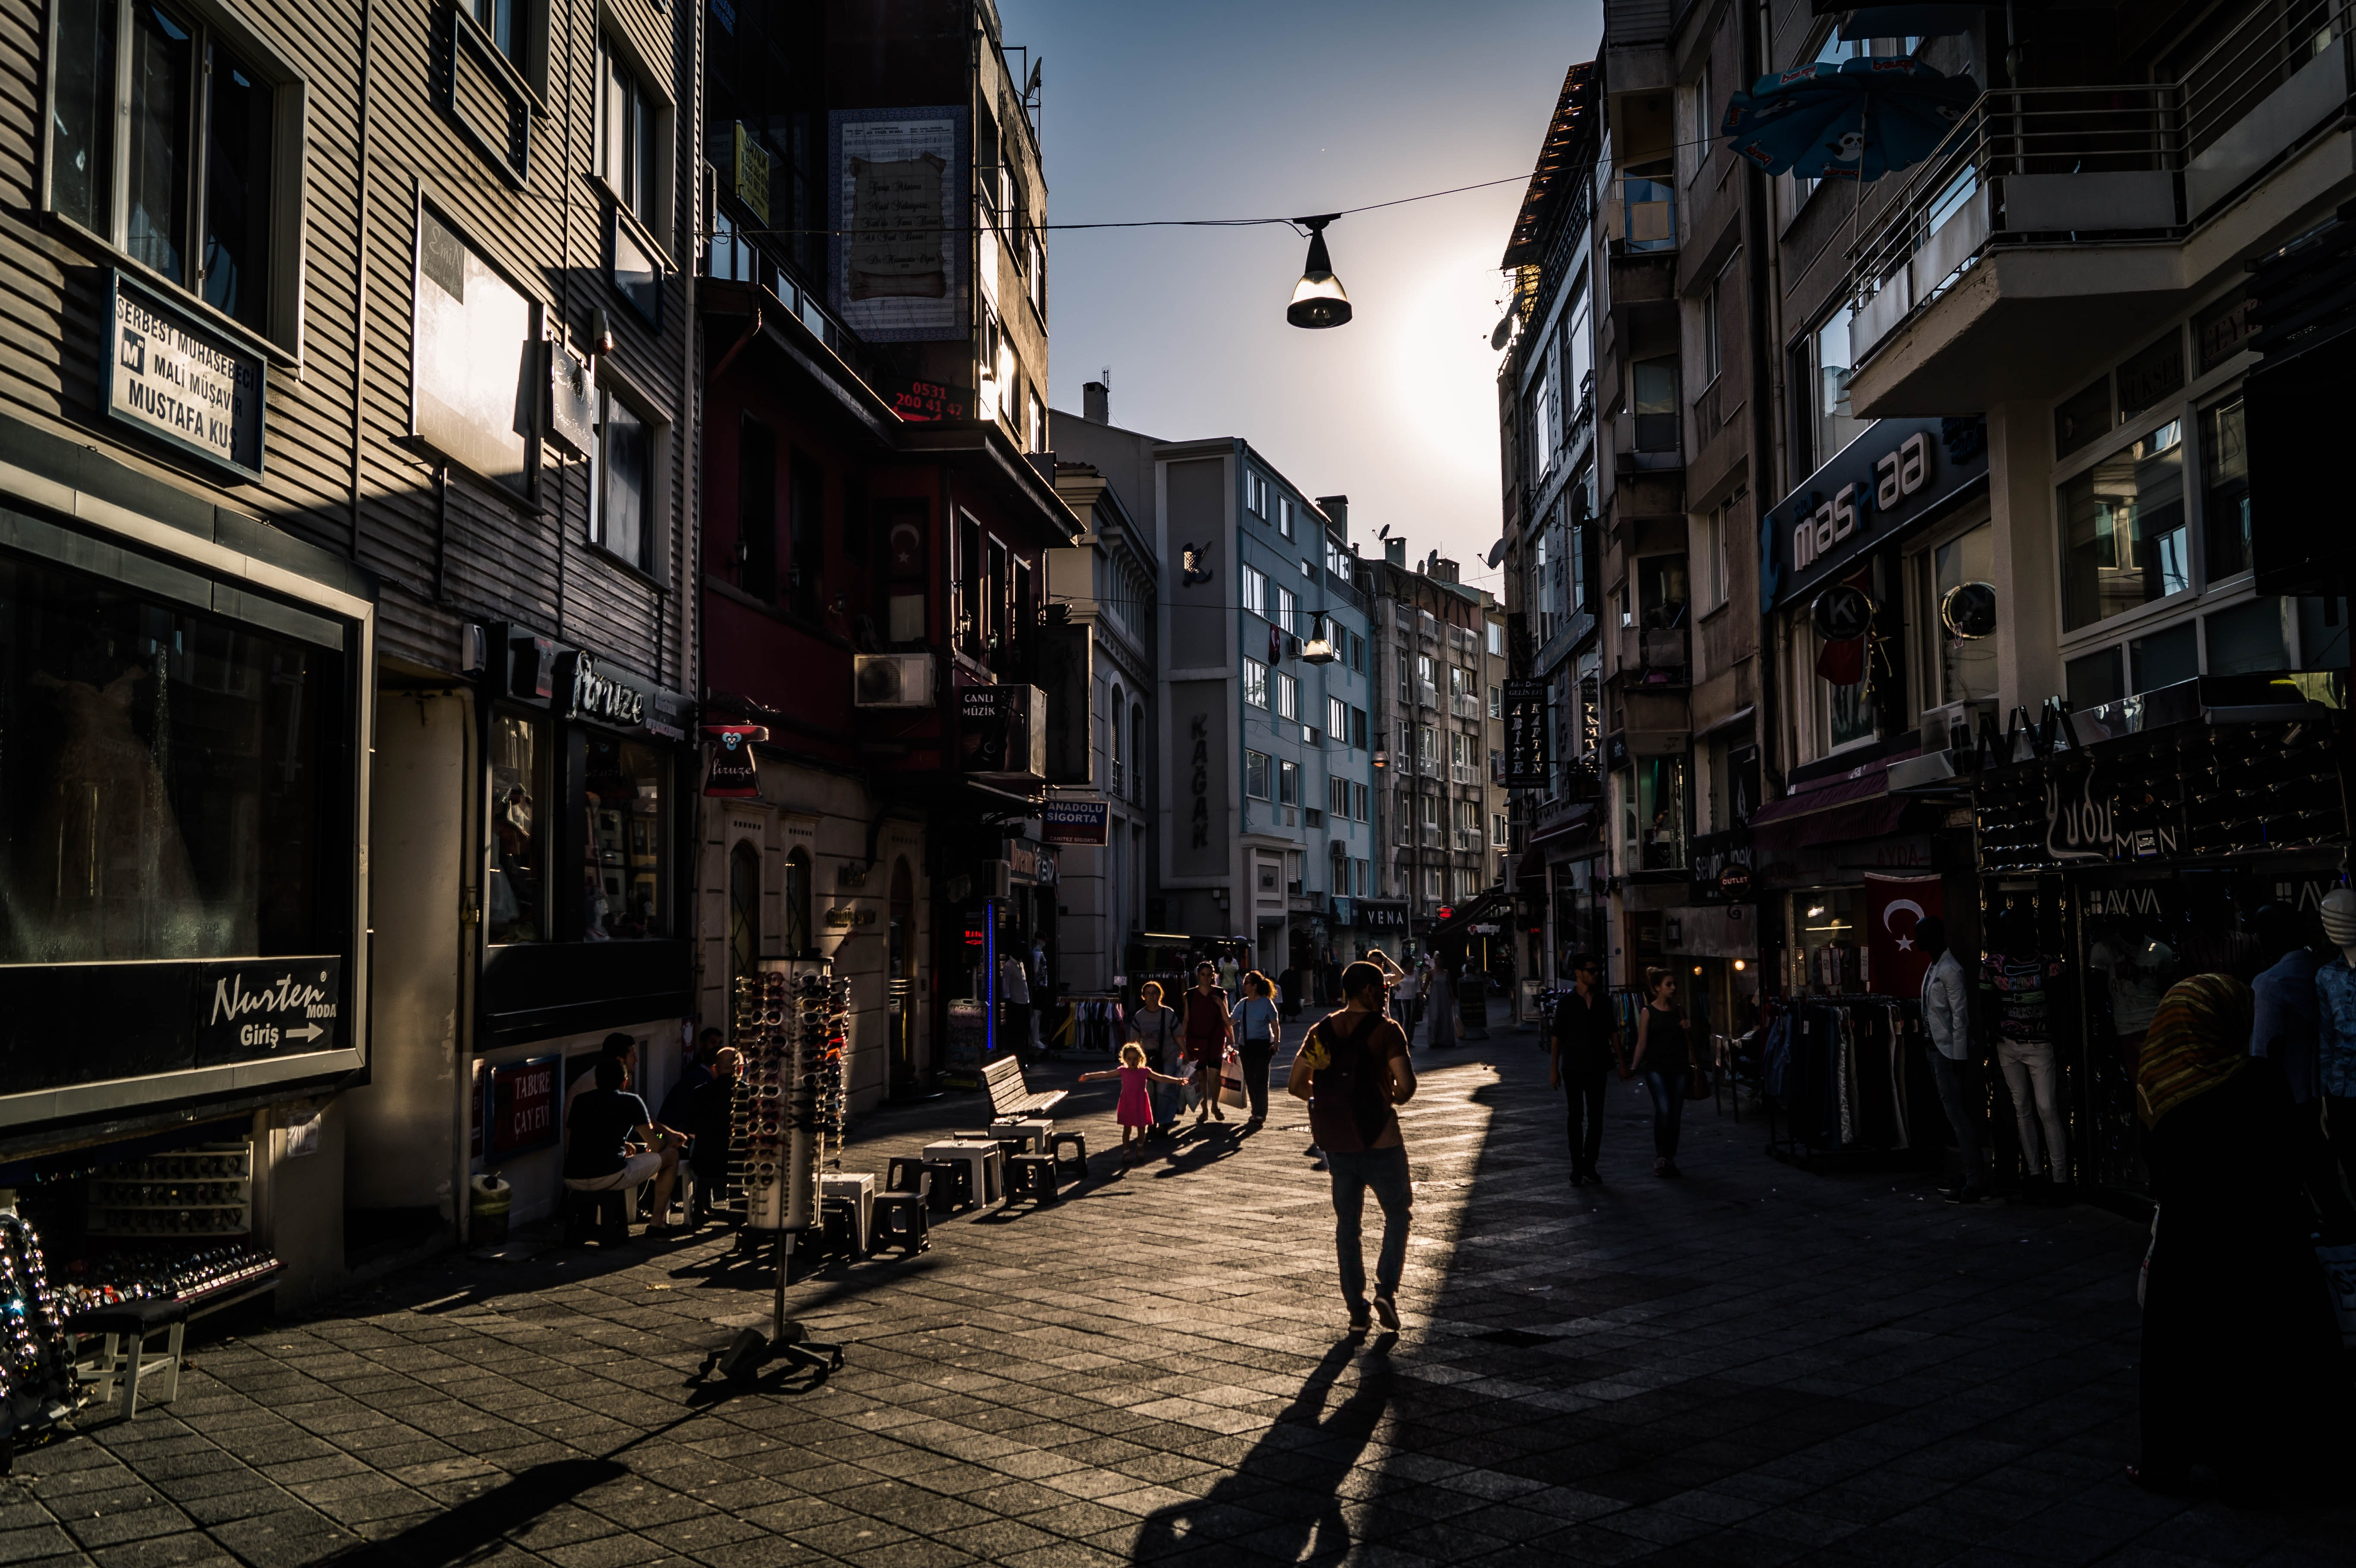 People Walking on Street Between High Rise Building, Road, Walking, Urban, Travel, HQ Photo